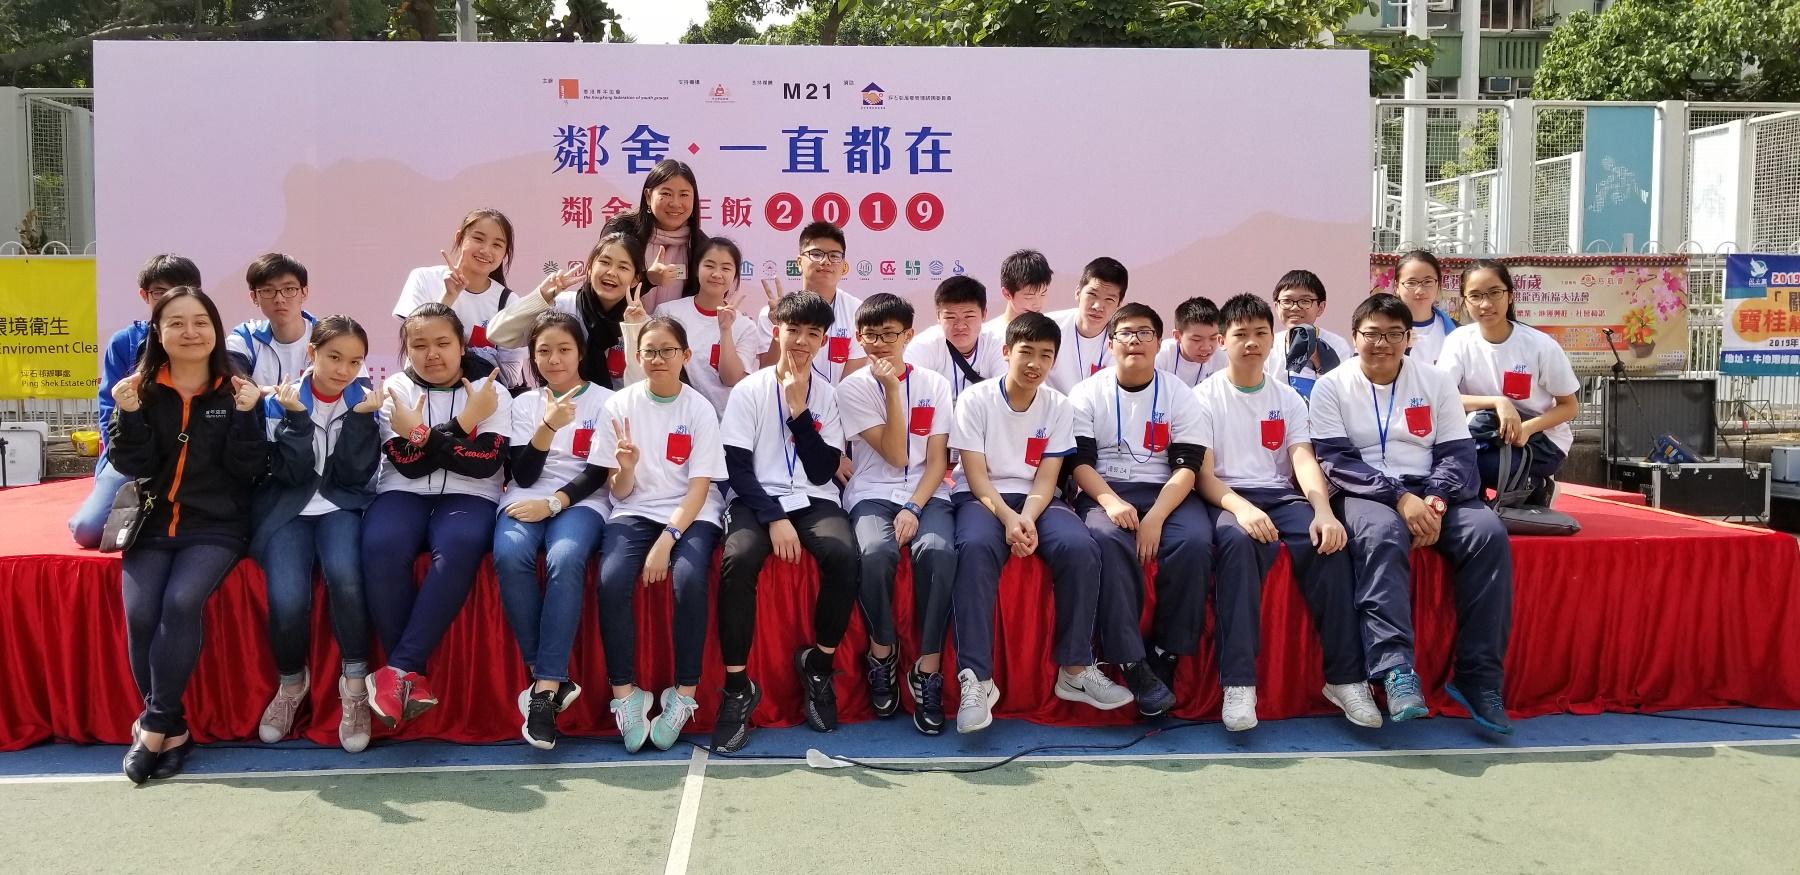 http://npc.edu.hk/sites/default/files/20190126_133211.jpg